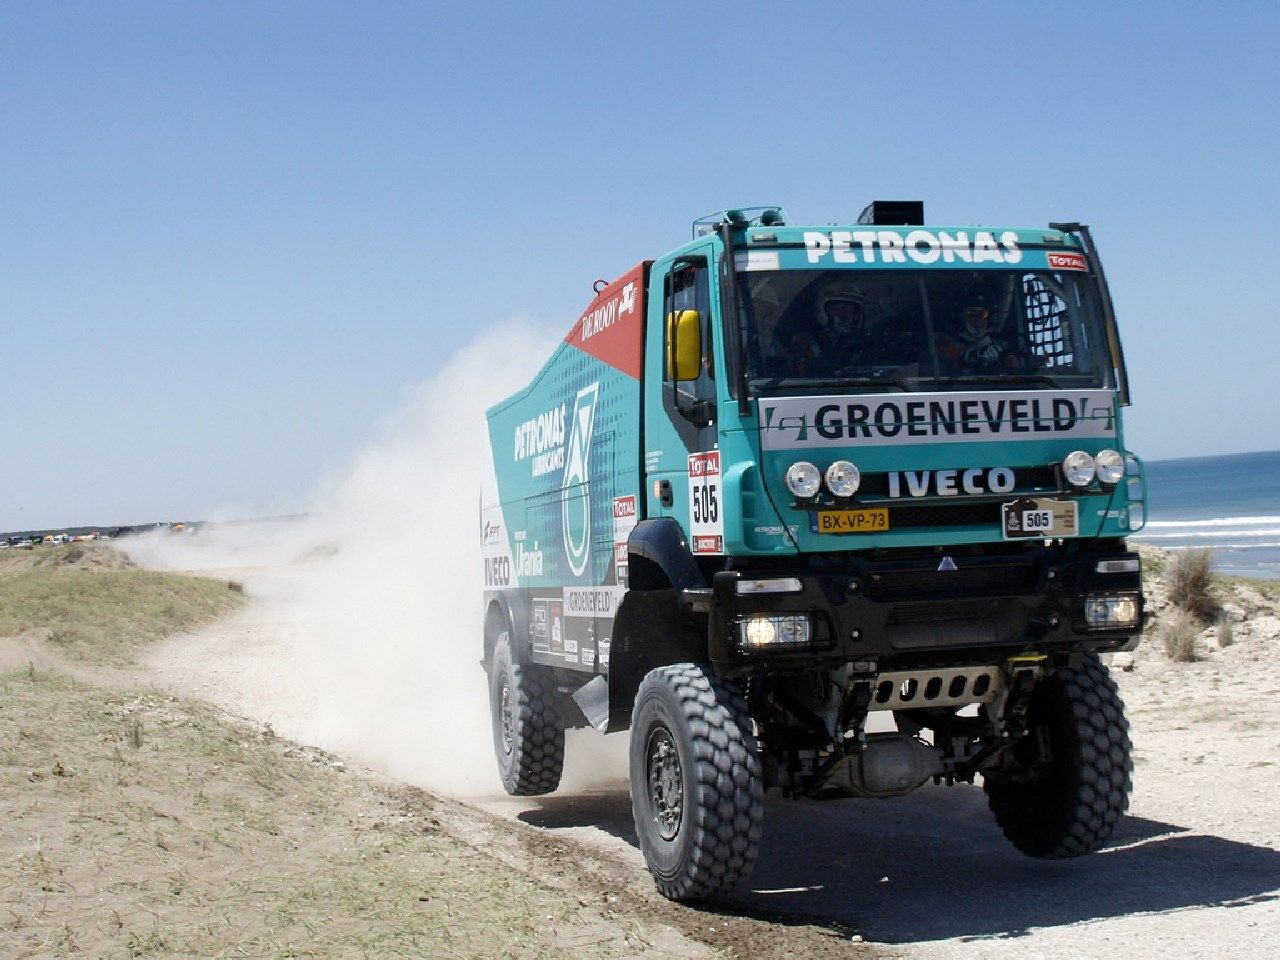 1280x960 Best iveco Monster trucks, Fire engine, Wallpaper